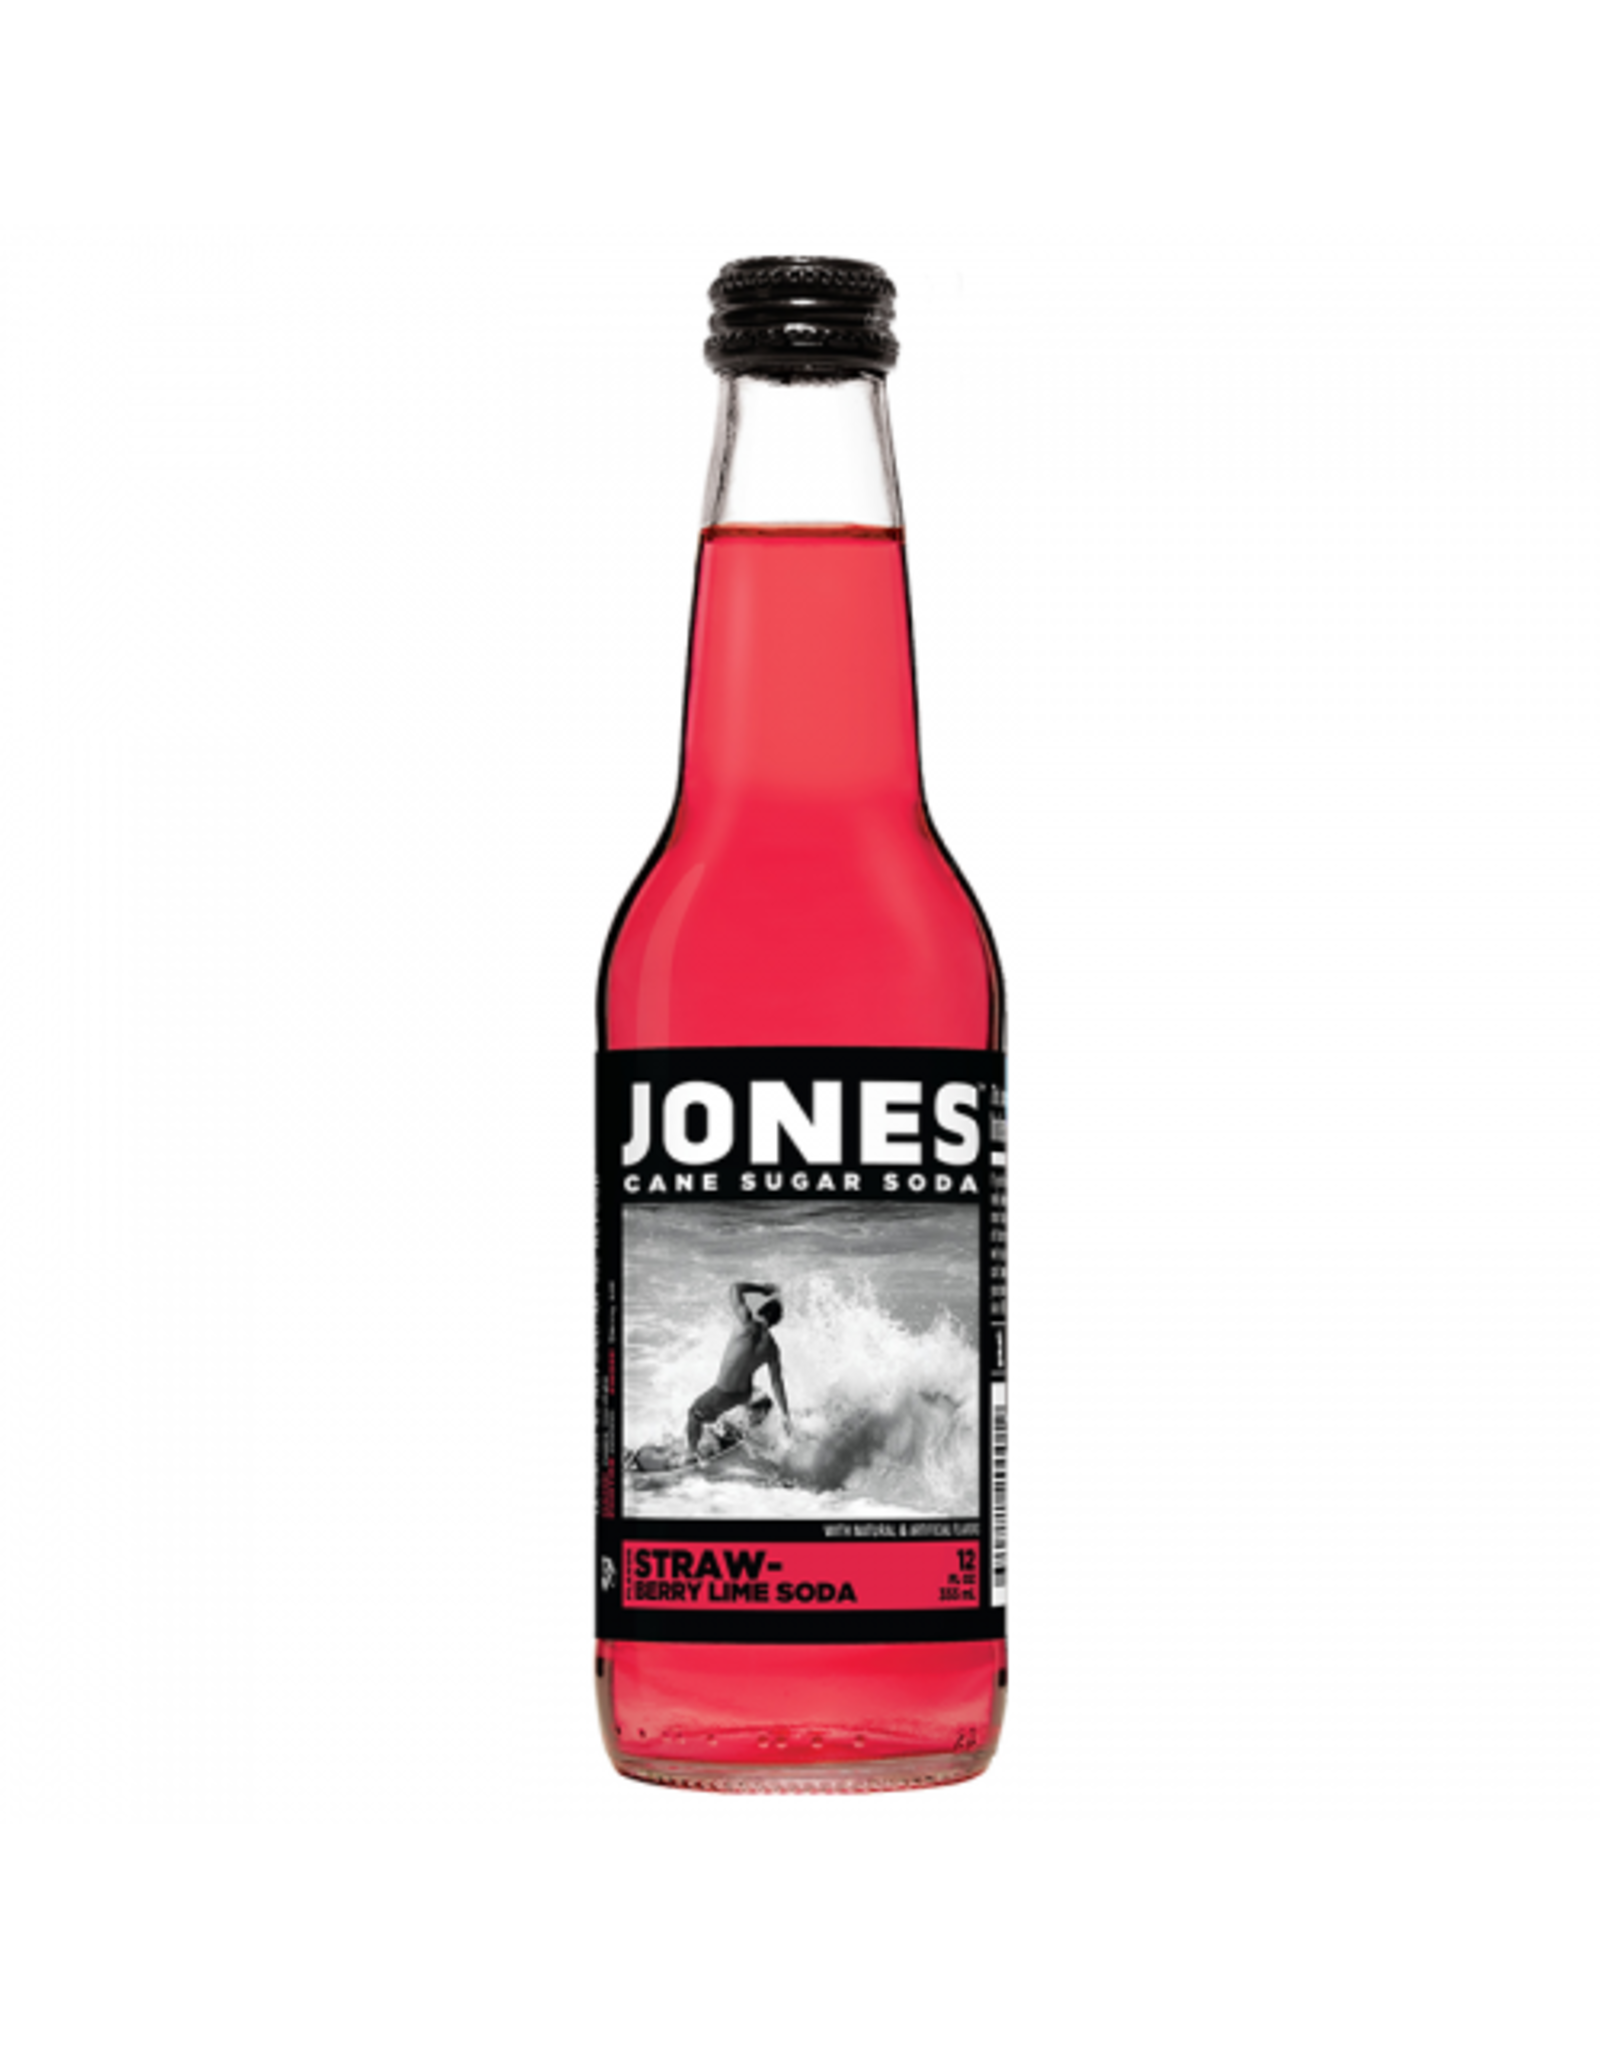 Jones - Strawberry Lime Soda - Cane Sugar Soda - 355ml